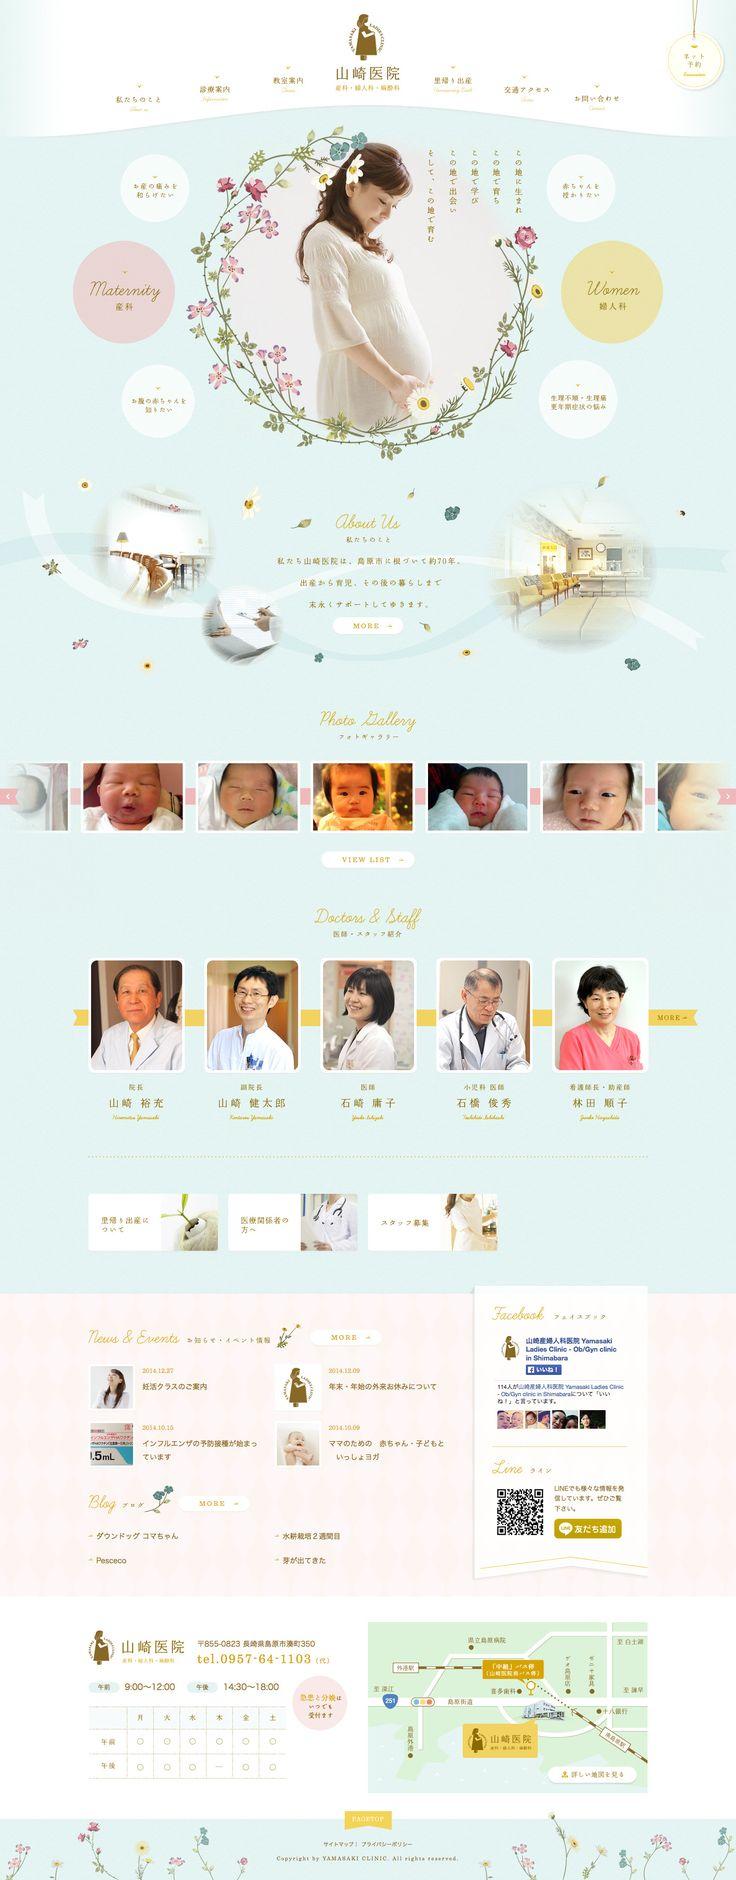 YAMASAKI MATERNITY CLINIC | CONDENSE Inc.